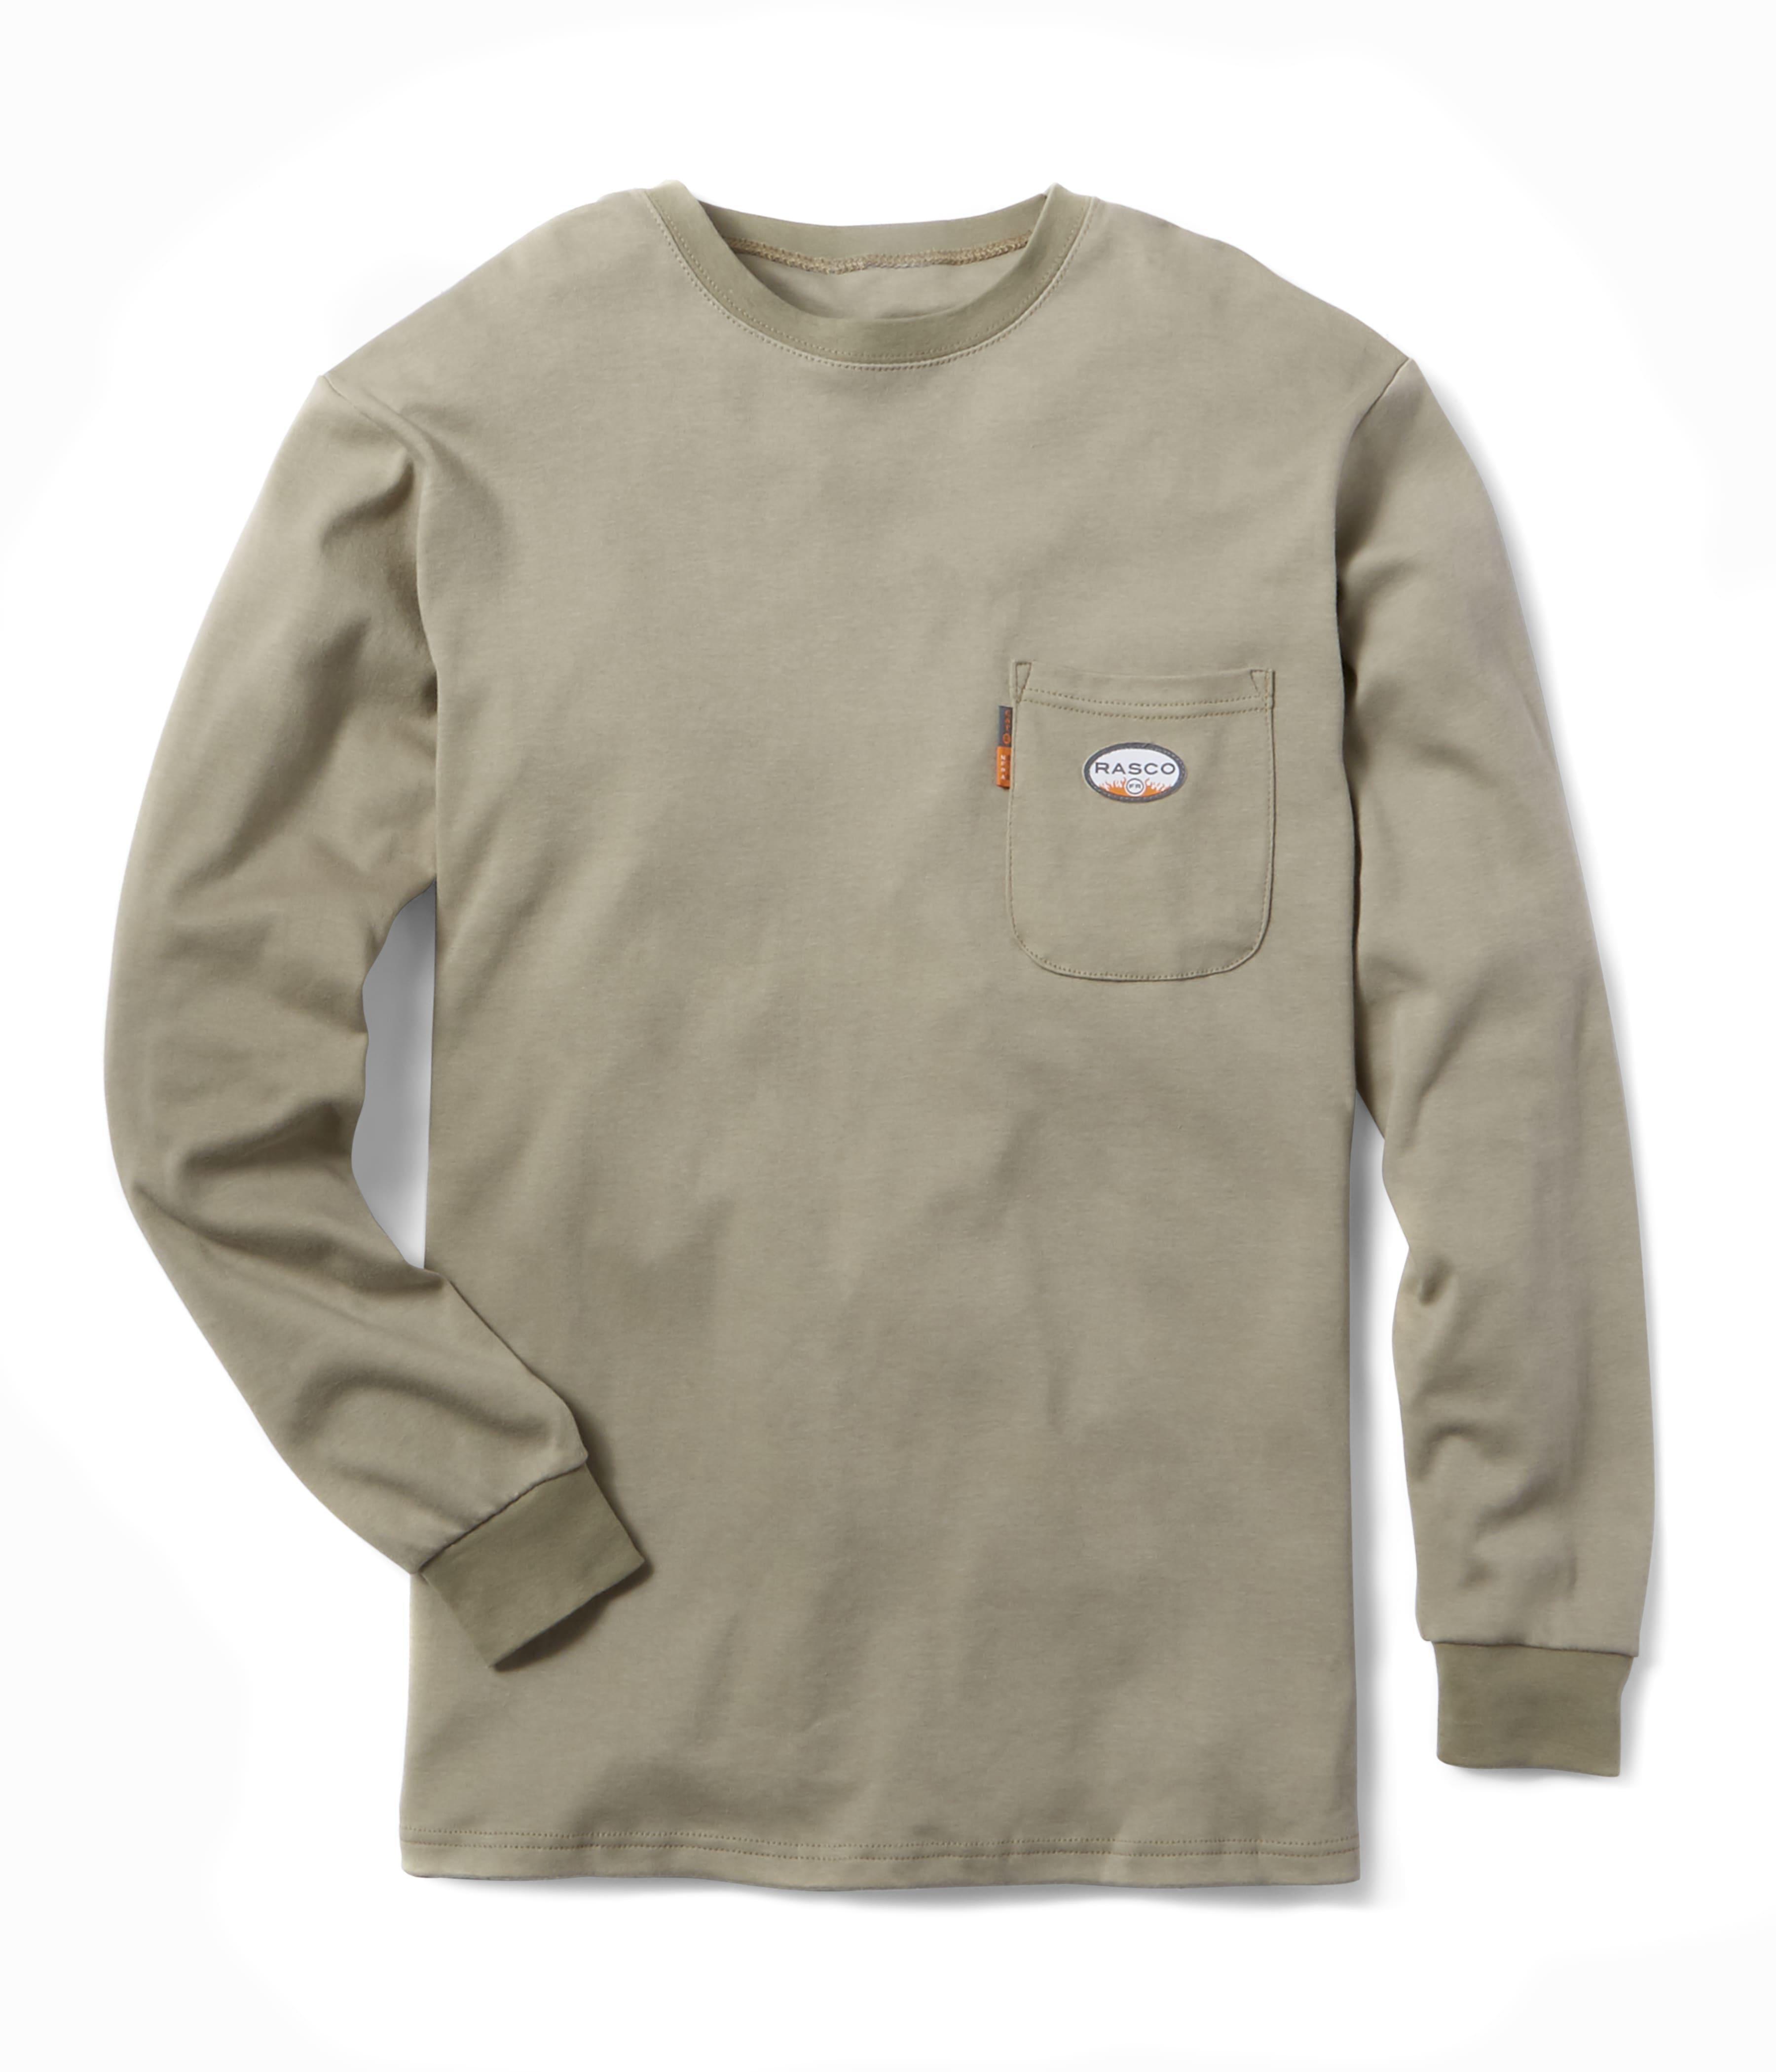 Rasco FR Navy Uniform Shirt